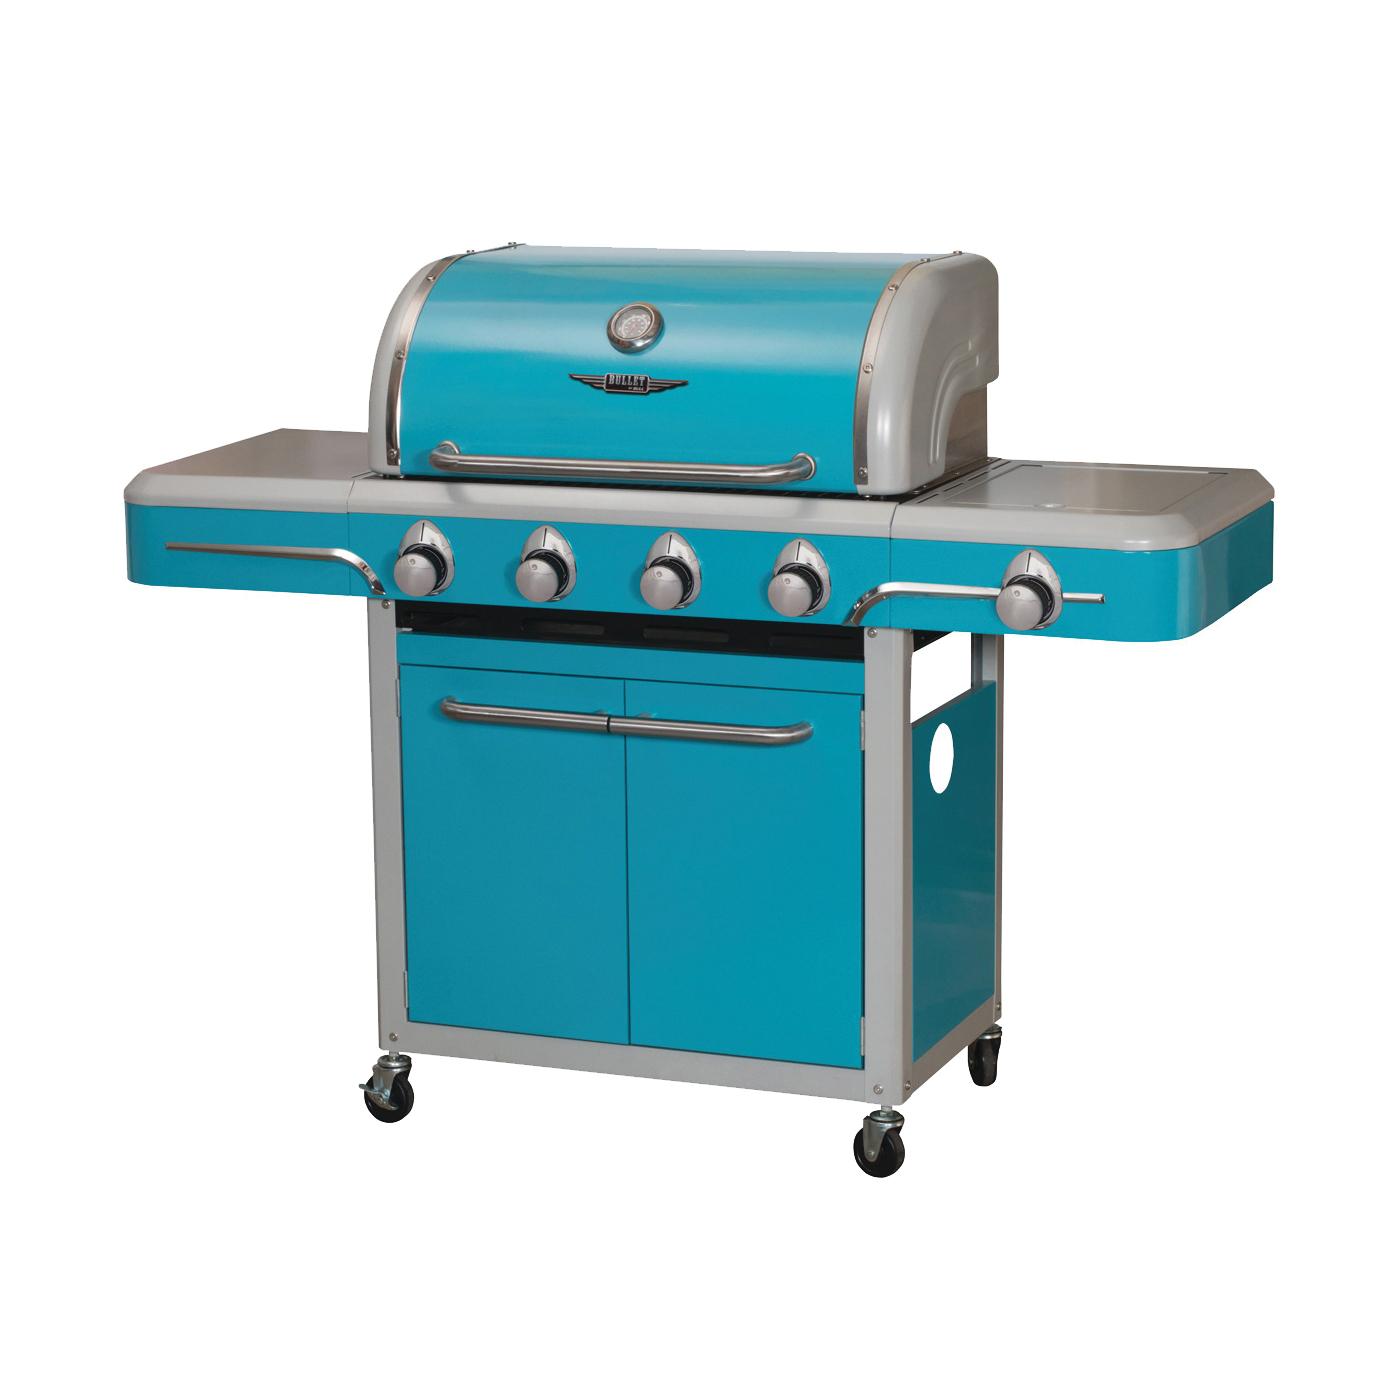 Picture of BULL 79006 Gas Grill, 12000 Btu BTU, 4 -Burner, Stainless Steel Body, Vintage Blue